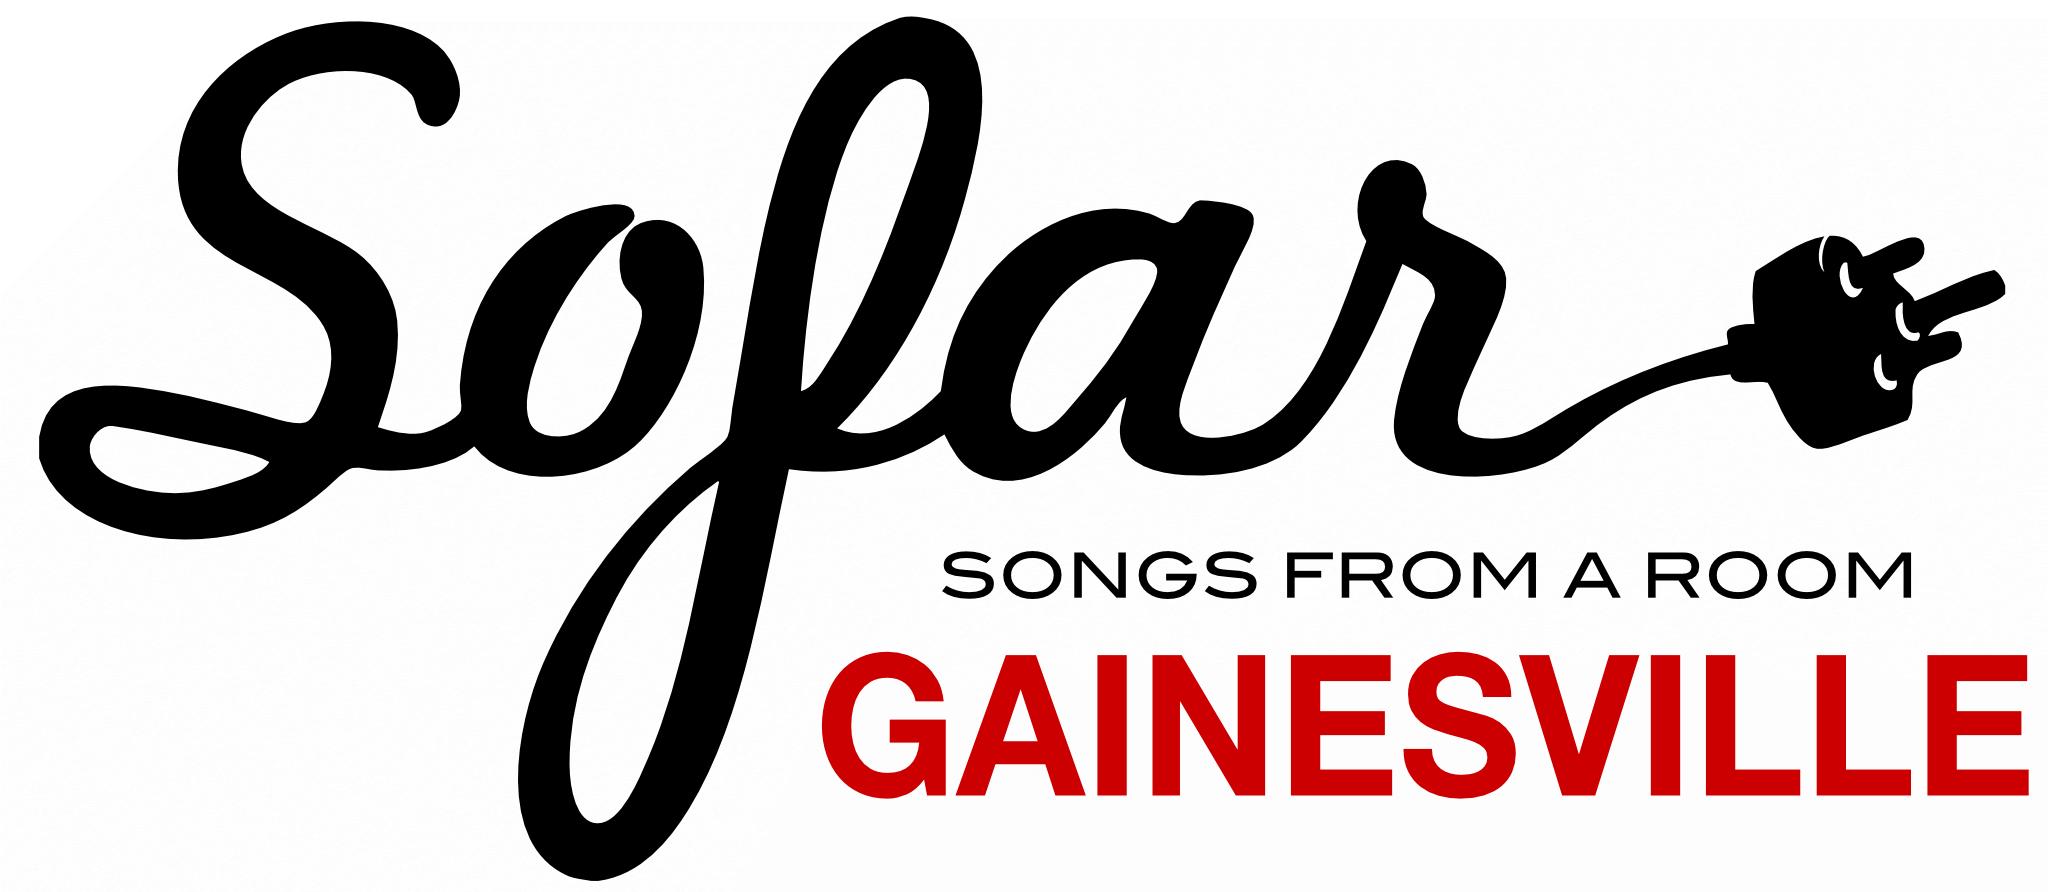 City Leader, Sofar Sounds Gainesville